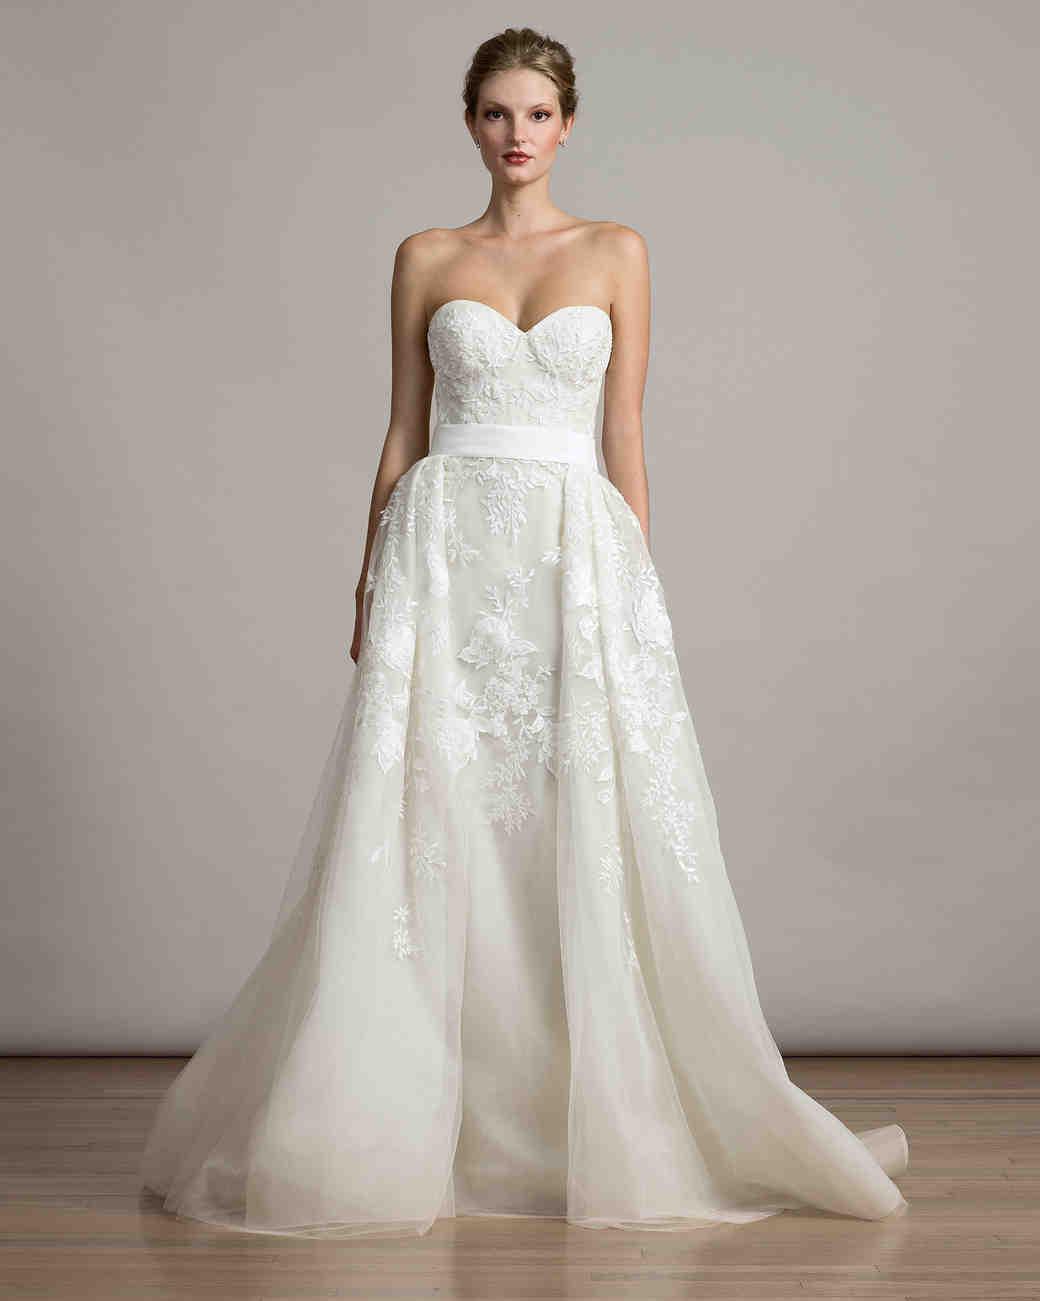 matthew christopher wedding dresses fall wedding dresses for fall Liancarlo Fall Wedding Dress Collection